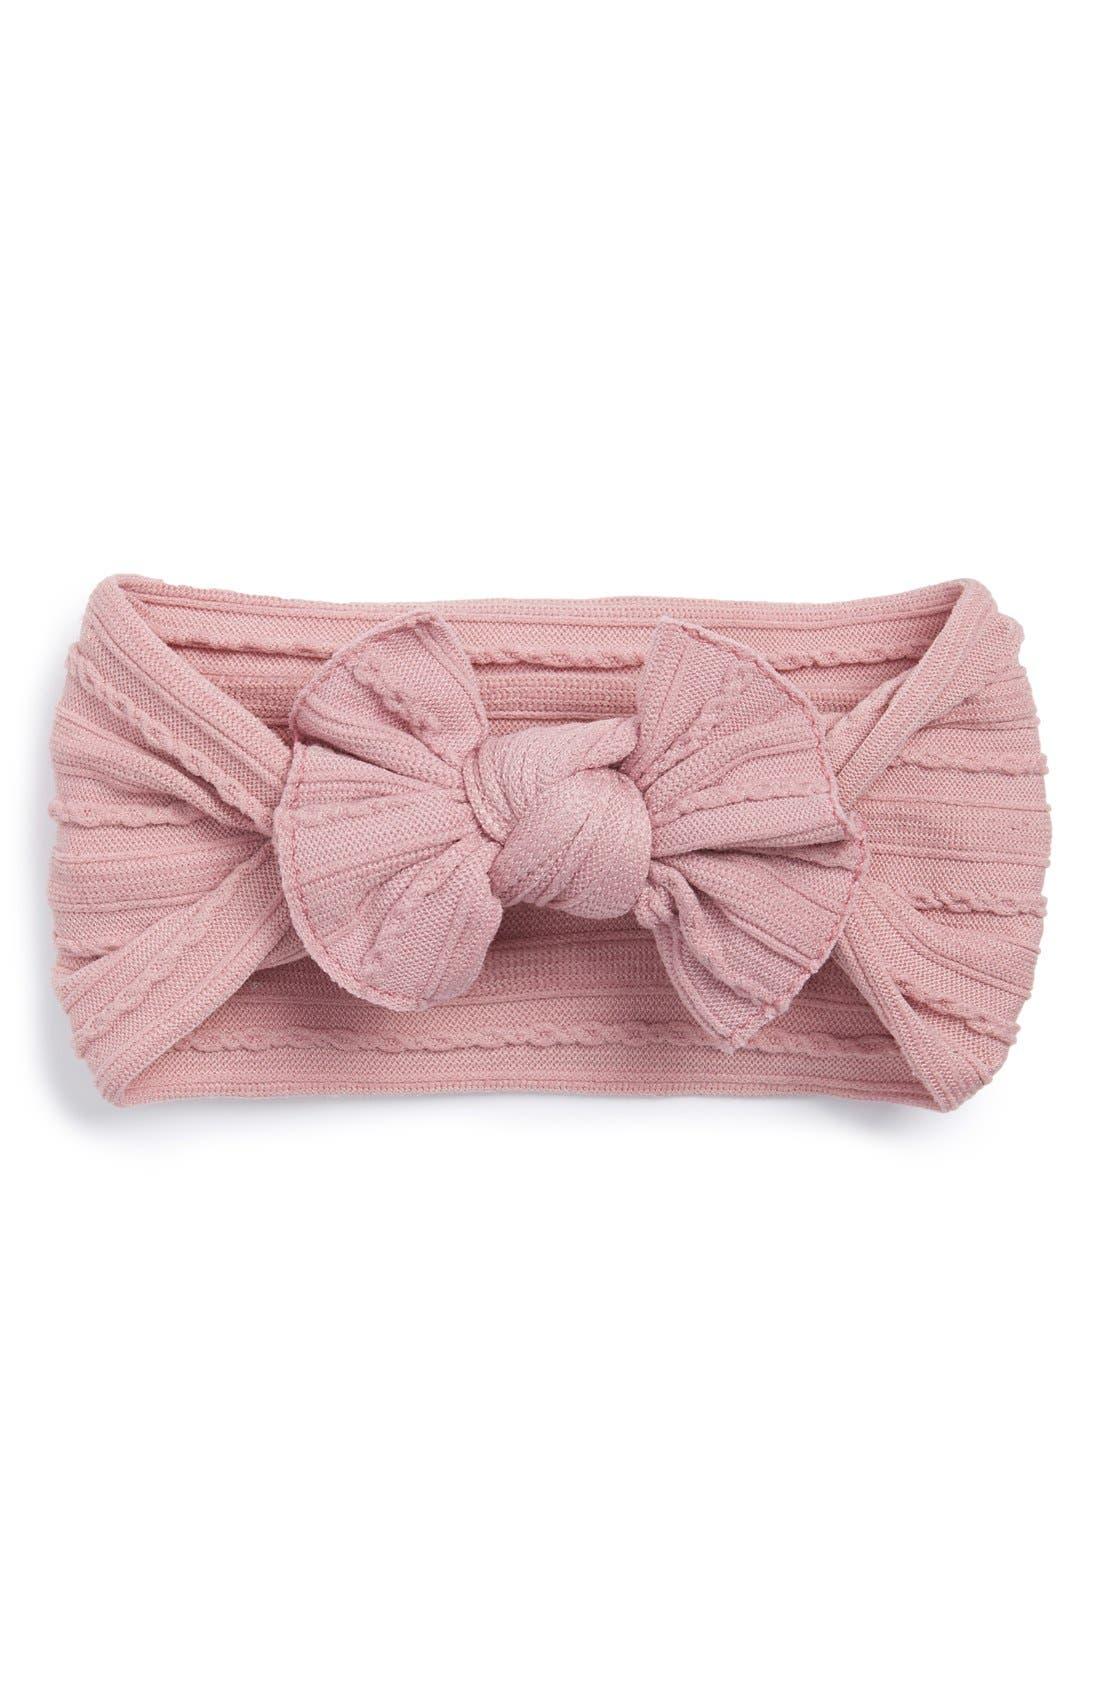 Baby BlingCable Knit Bow Headband (Baby Girls)